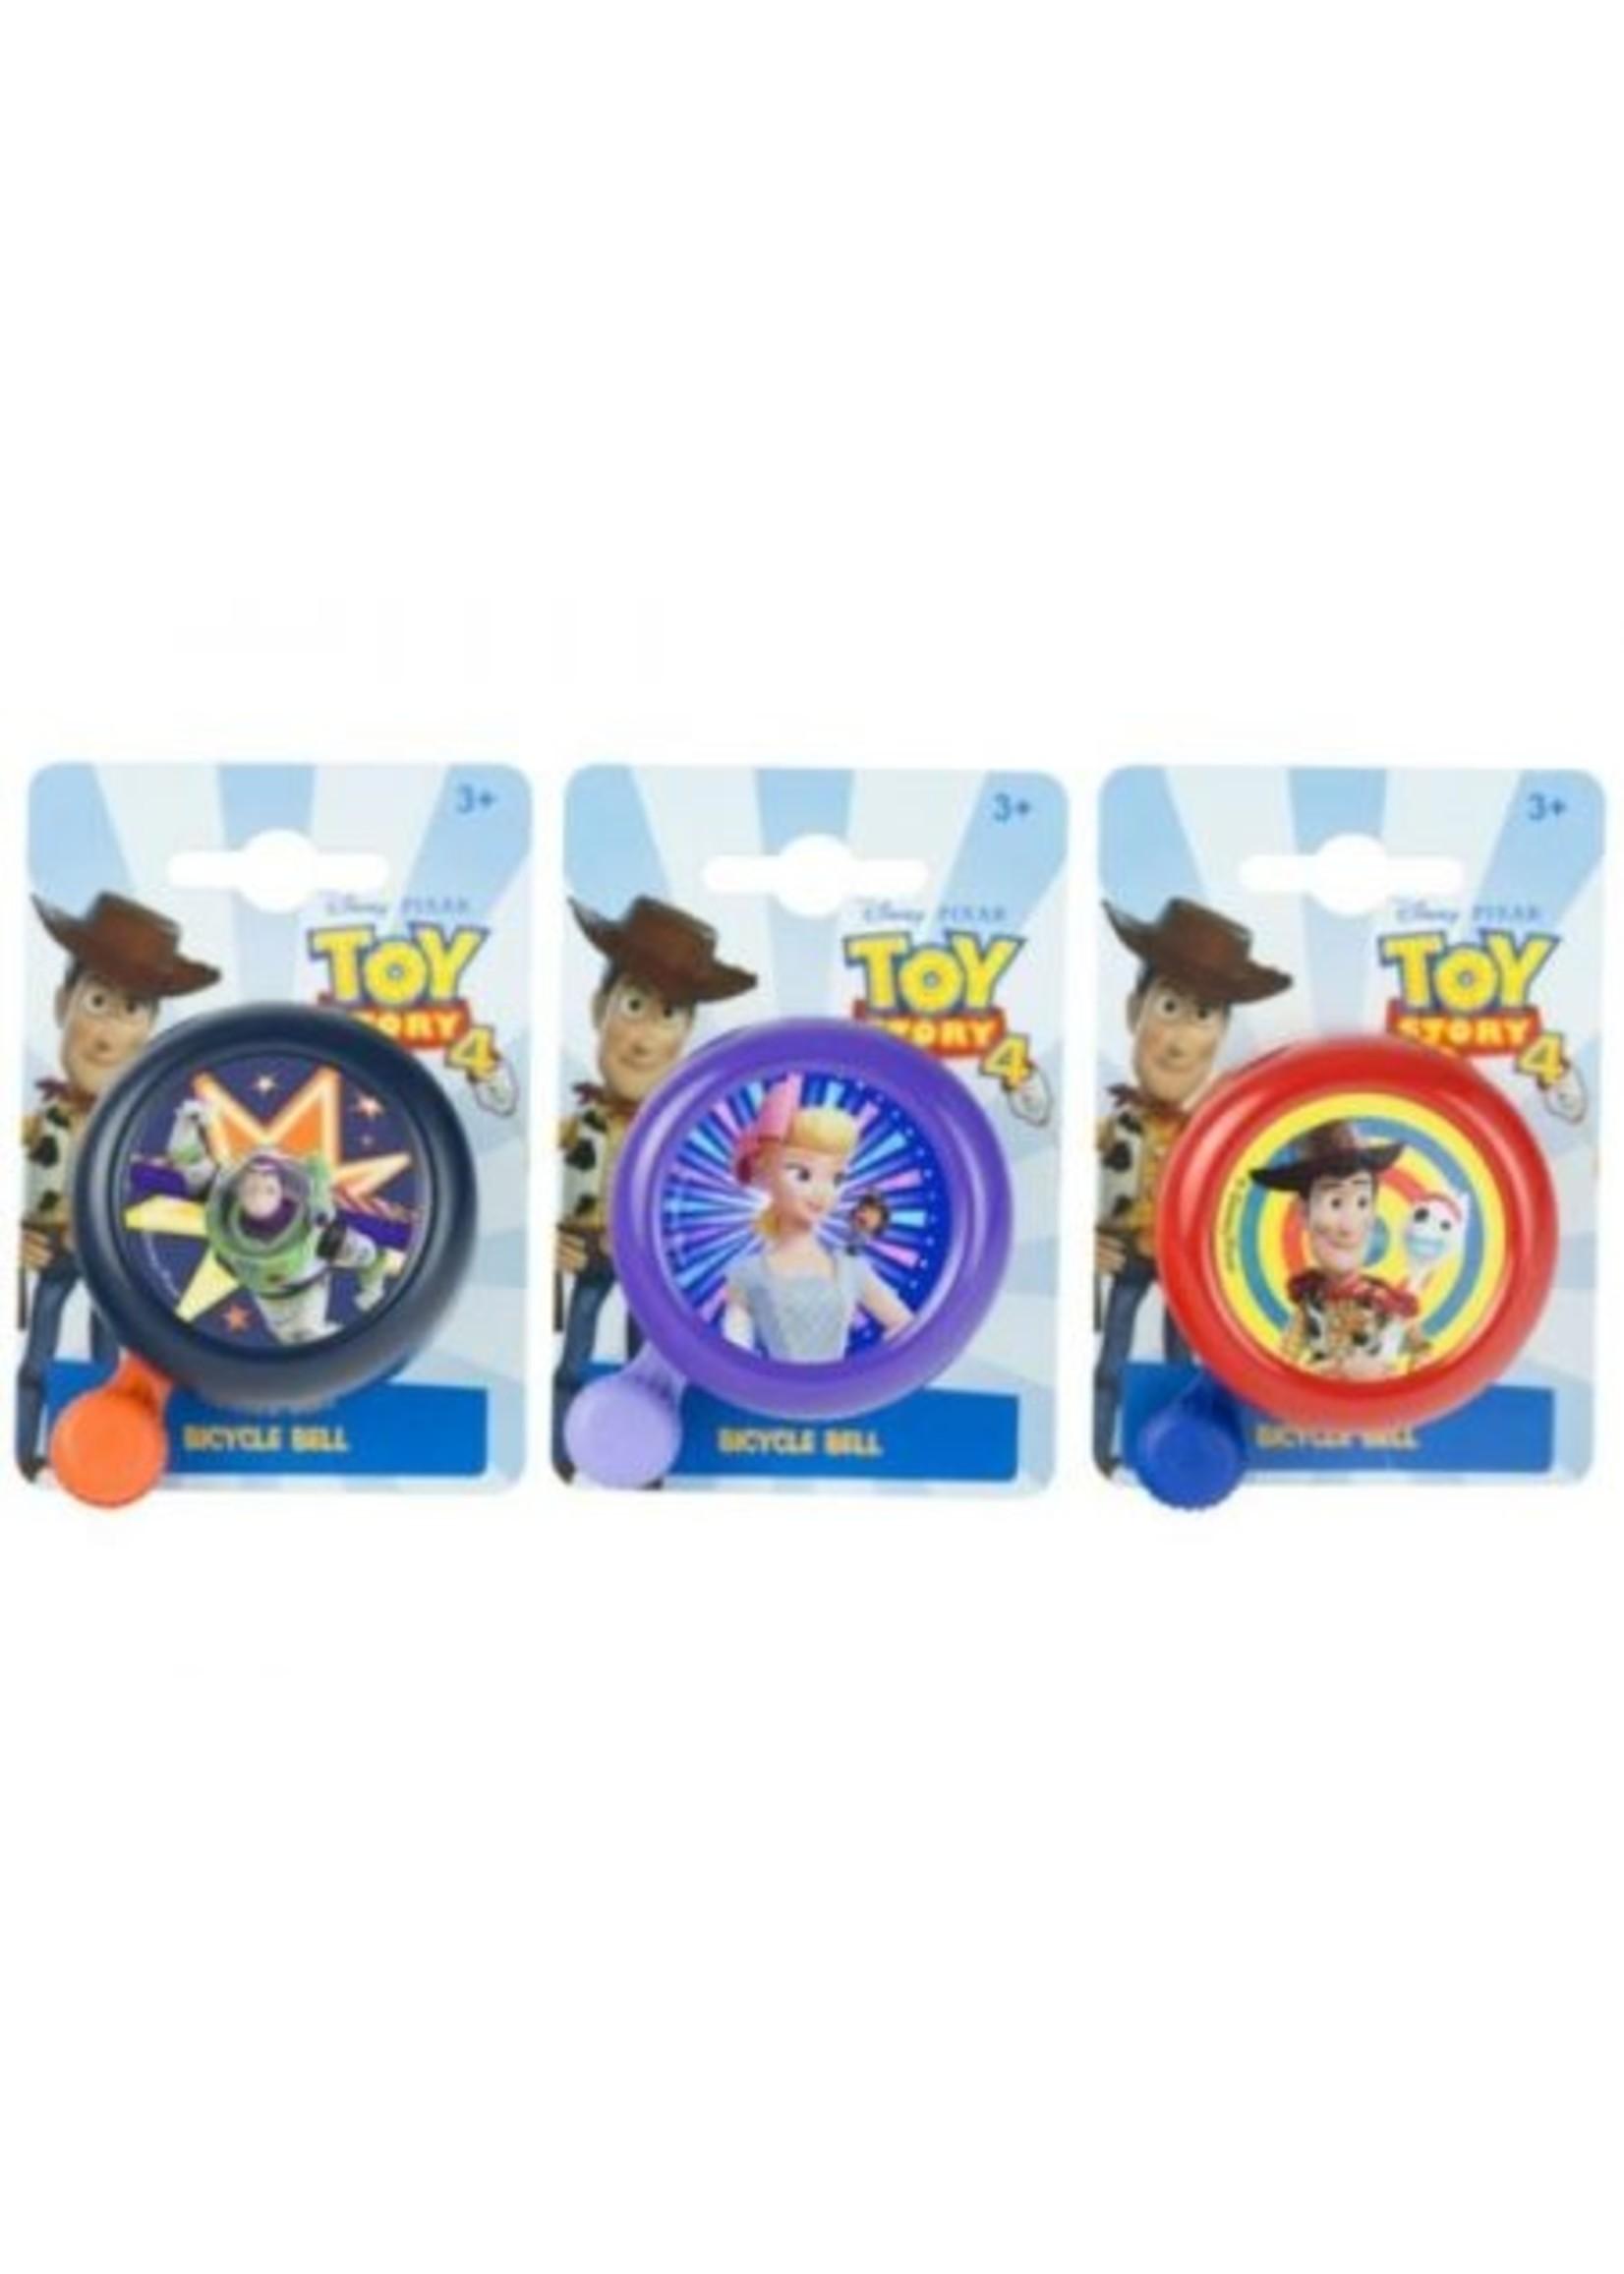 Disney Kids Toy Story 4 Bell